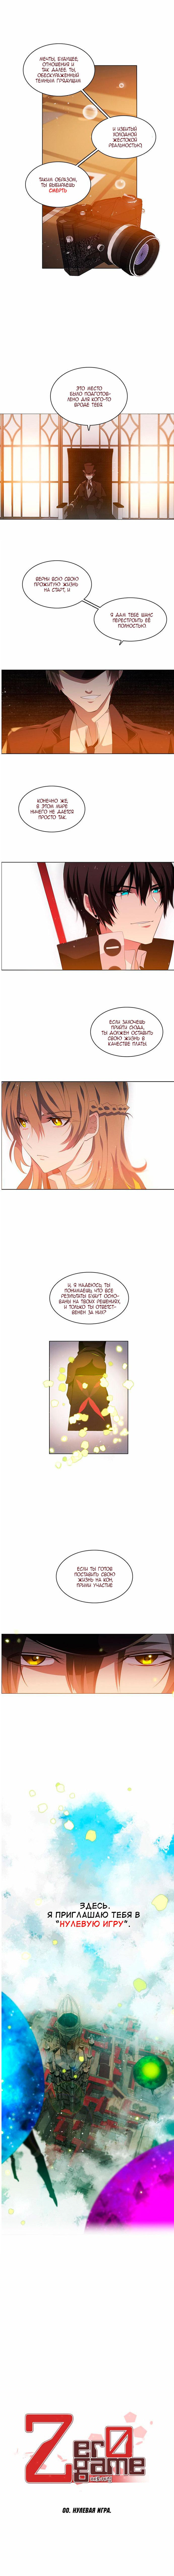 https://r1.ninemanga.com/comics/pic2/14/28878/288629/1460250418347.jpg Page 1